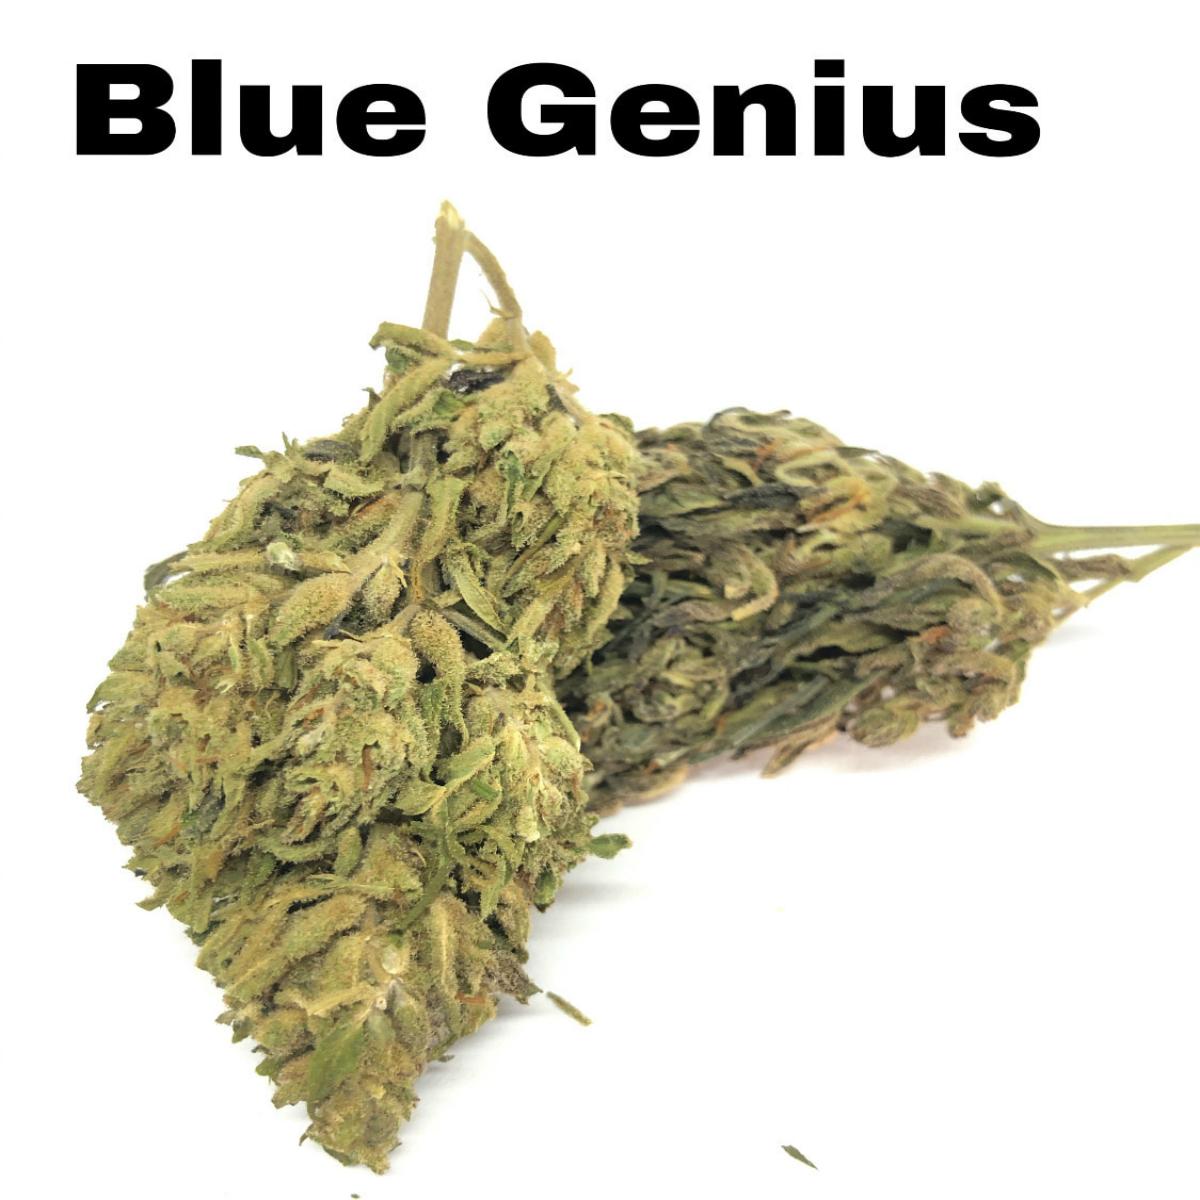 Blue Genius CBD Hemp Flower